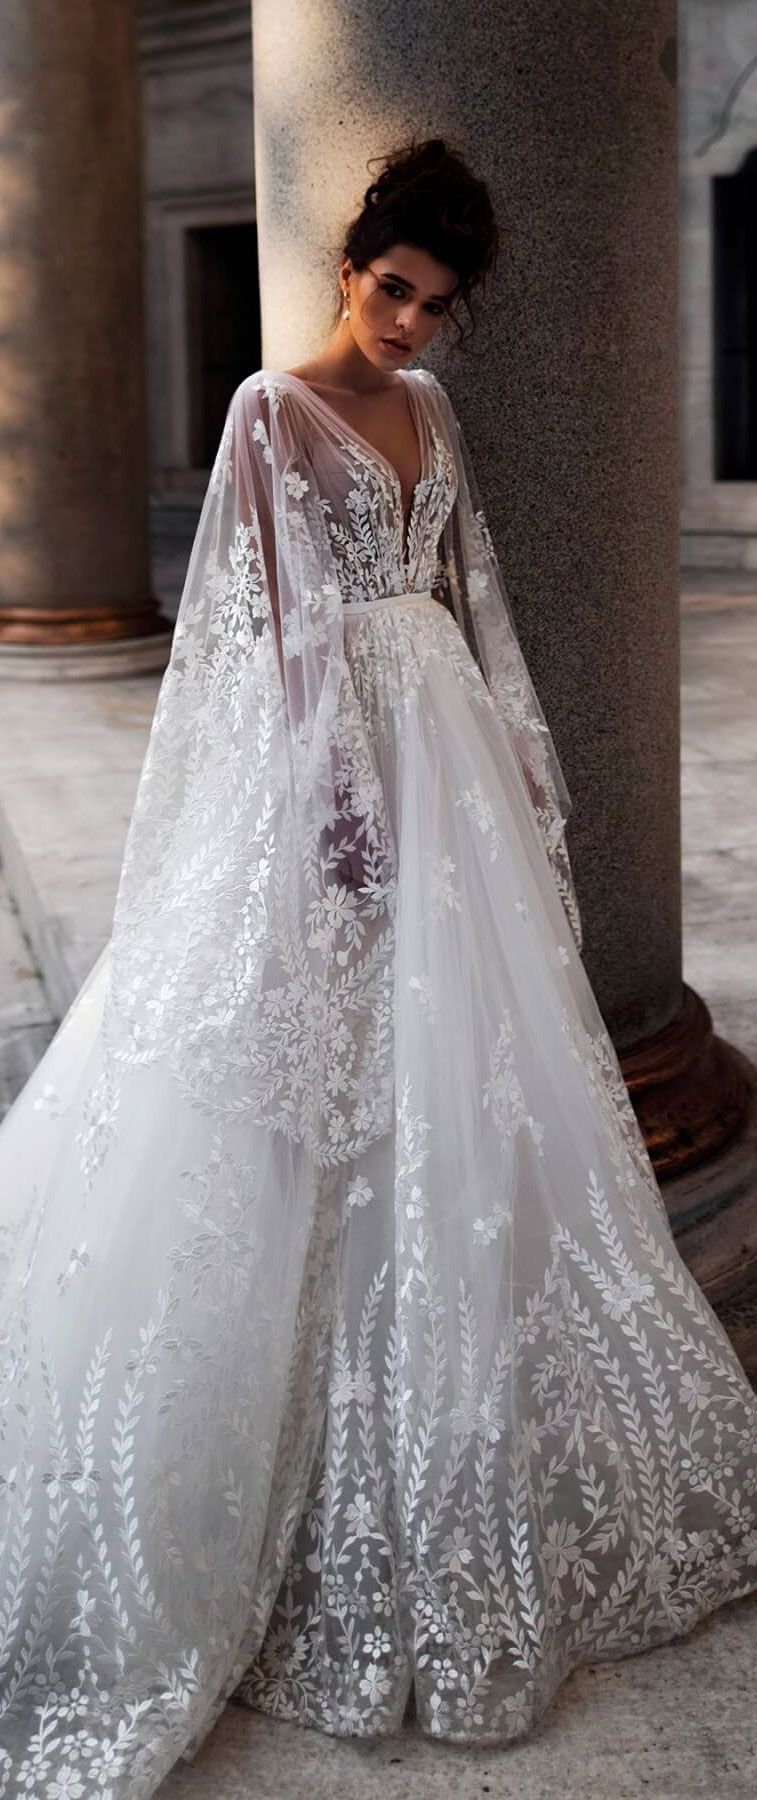 BLAMMO-BIAMO Wedding Dress Inspiration